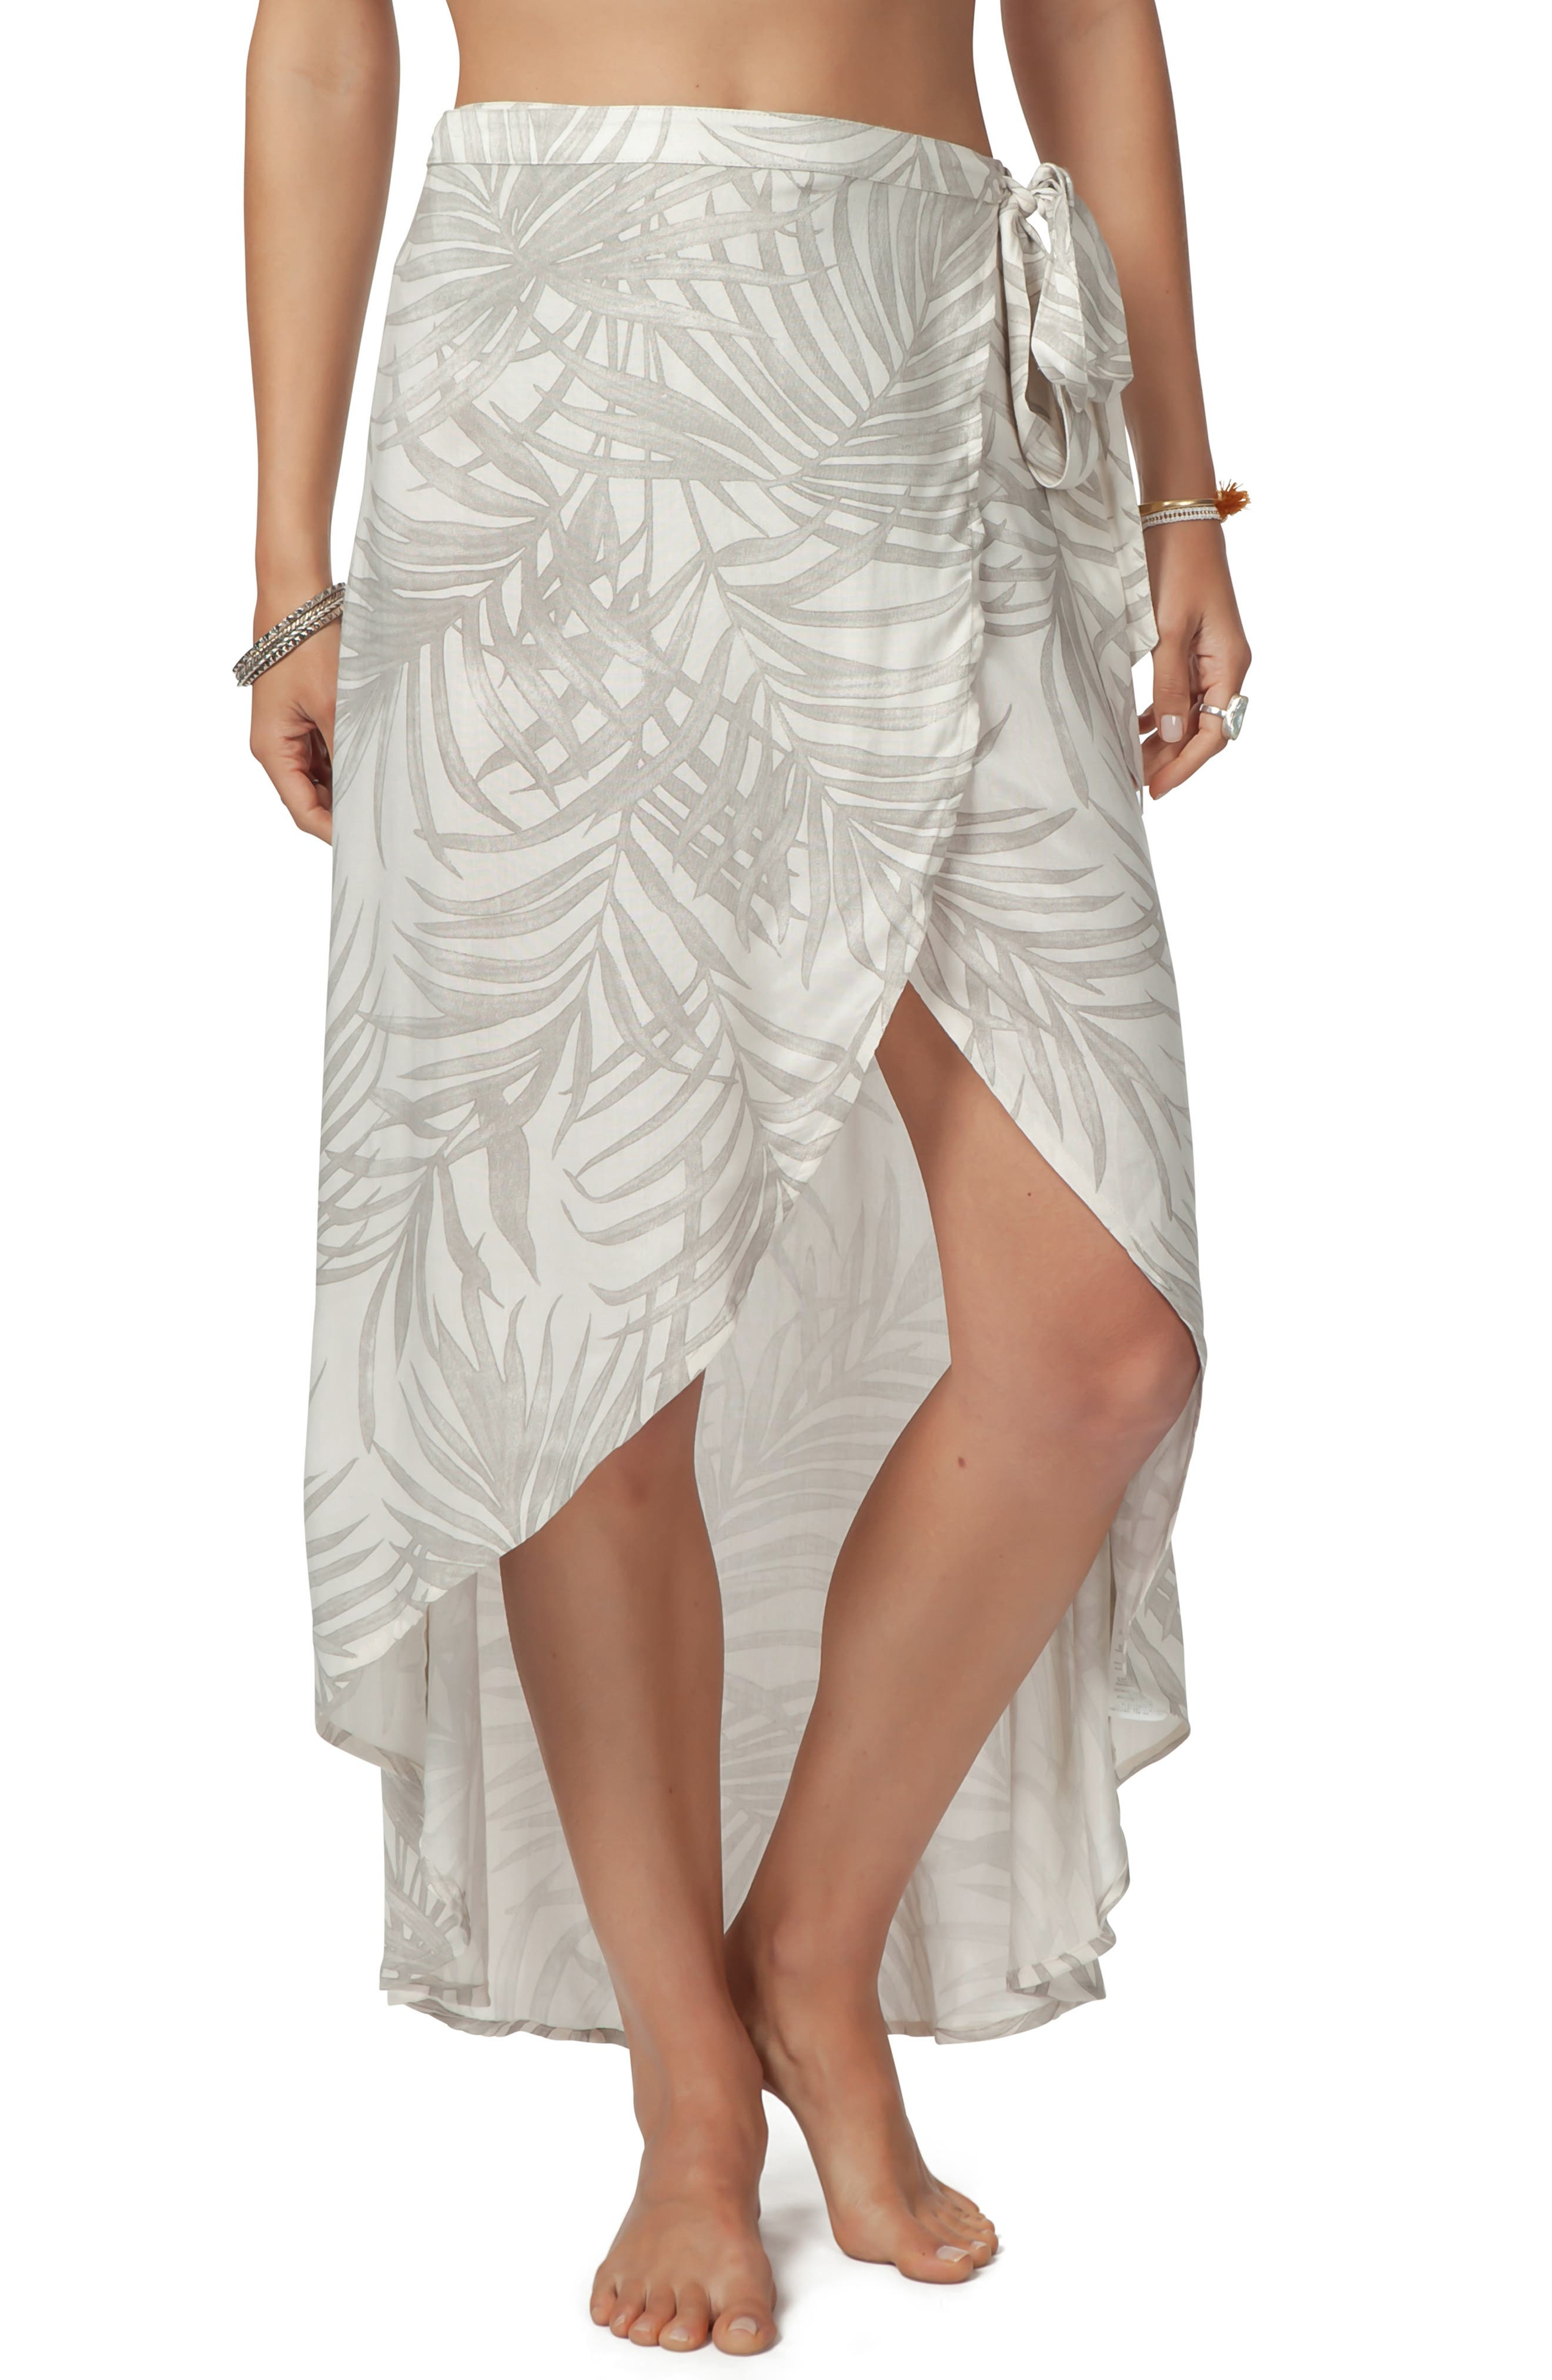 Rip Curl Shorelines Wrap Skirt, Ivory